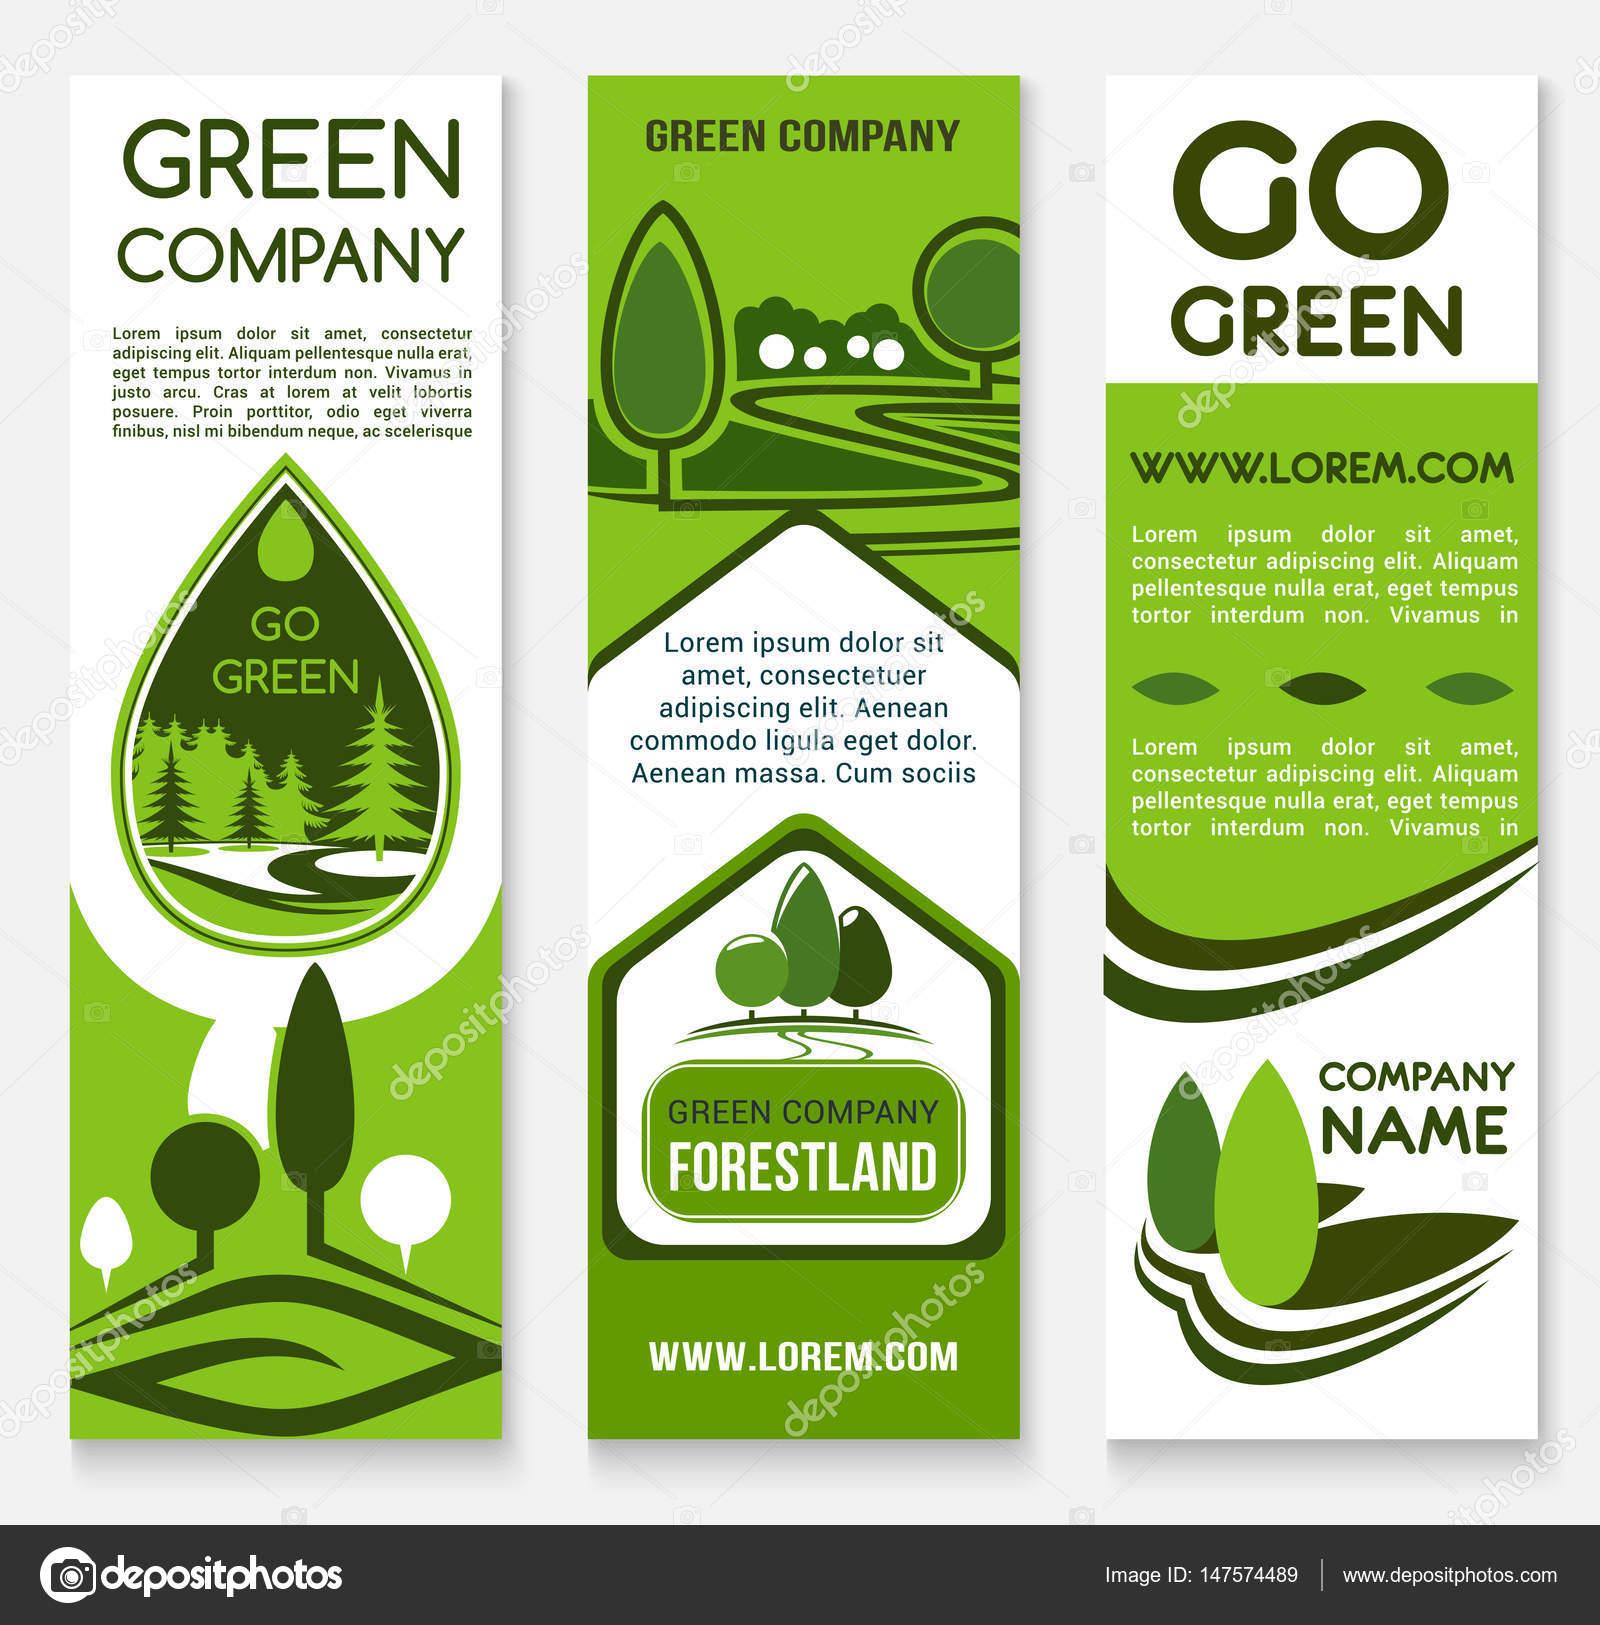 Modelo De Banner De Empresa De Negócios Verde Eco Vetor